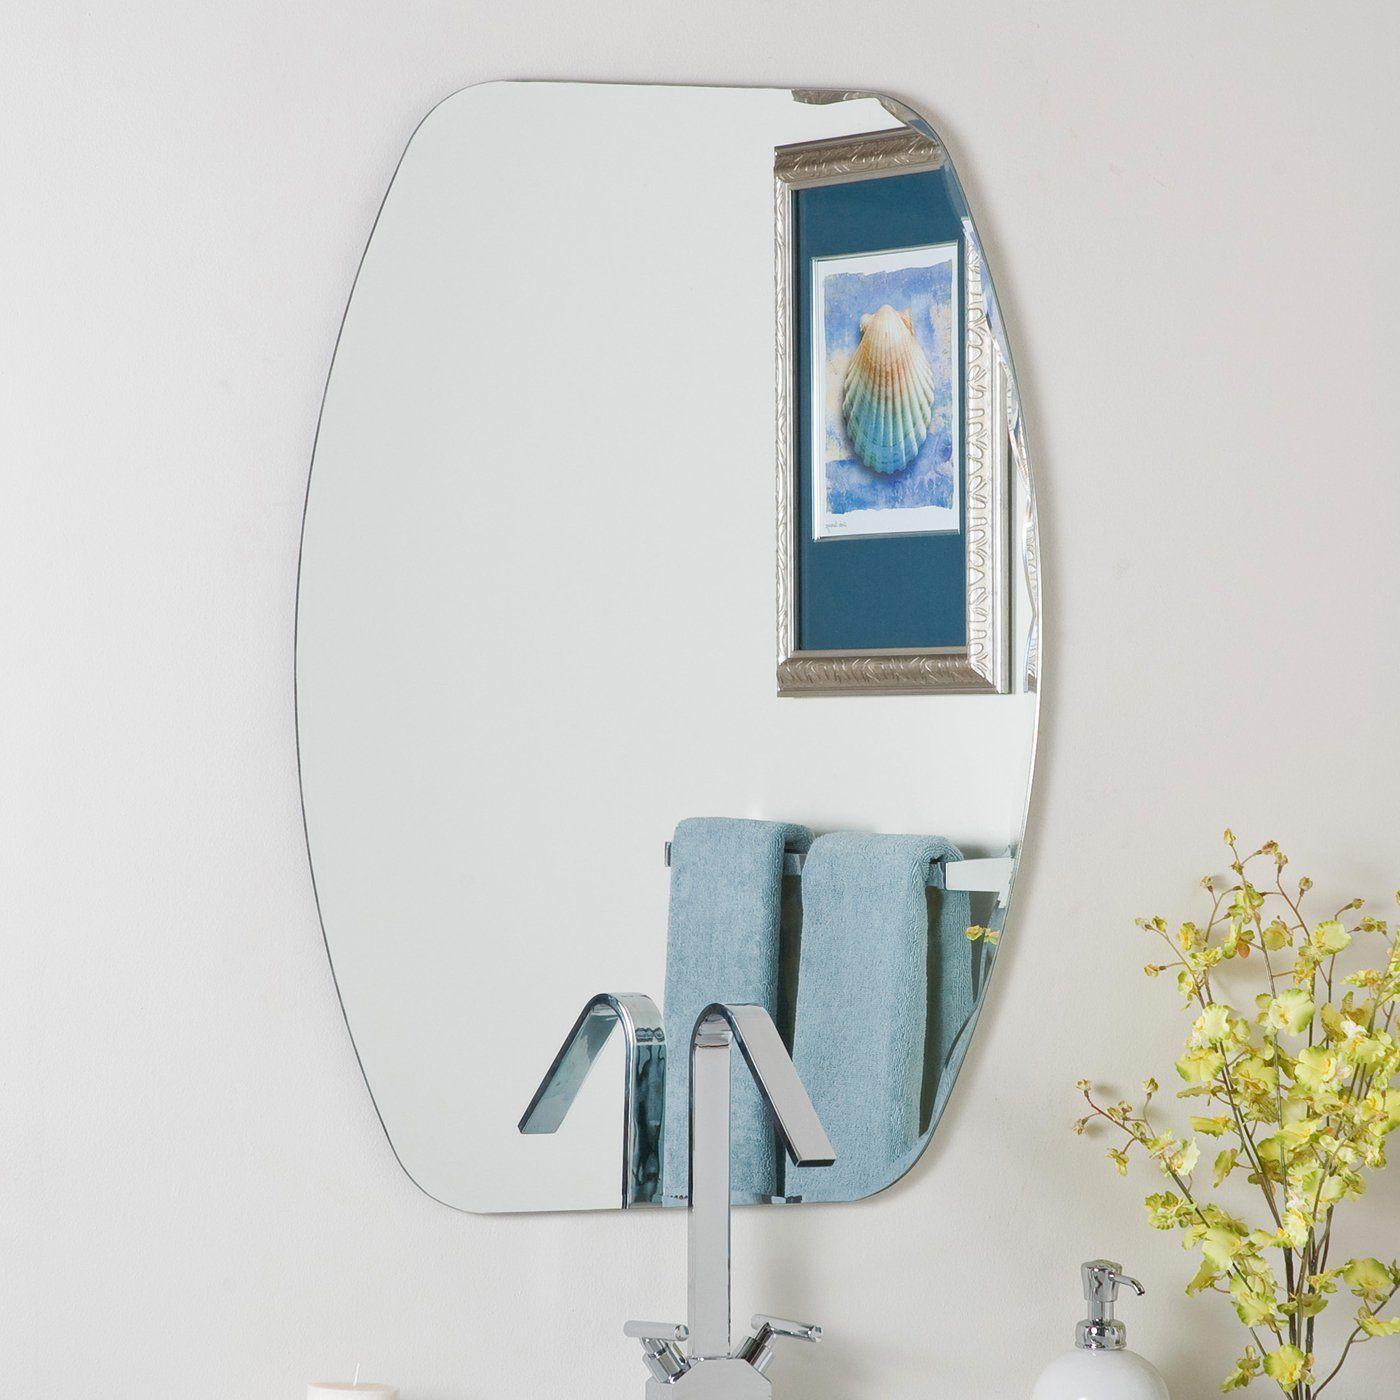 decor wonderland ssm308 frameless oval beveled mirror | lowe's